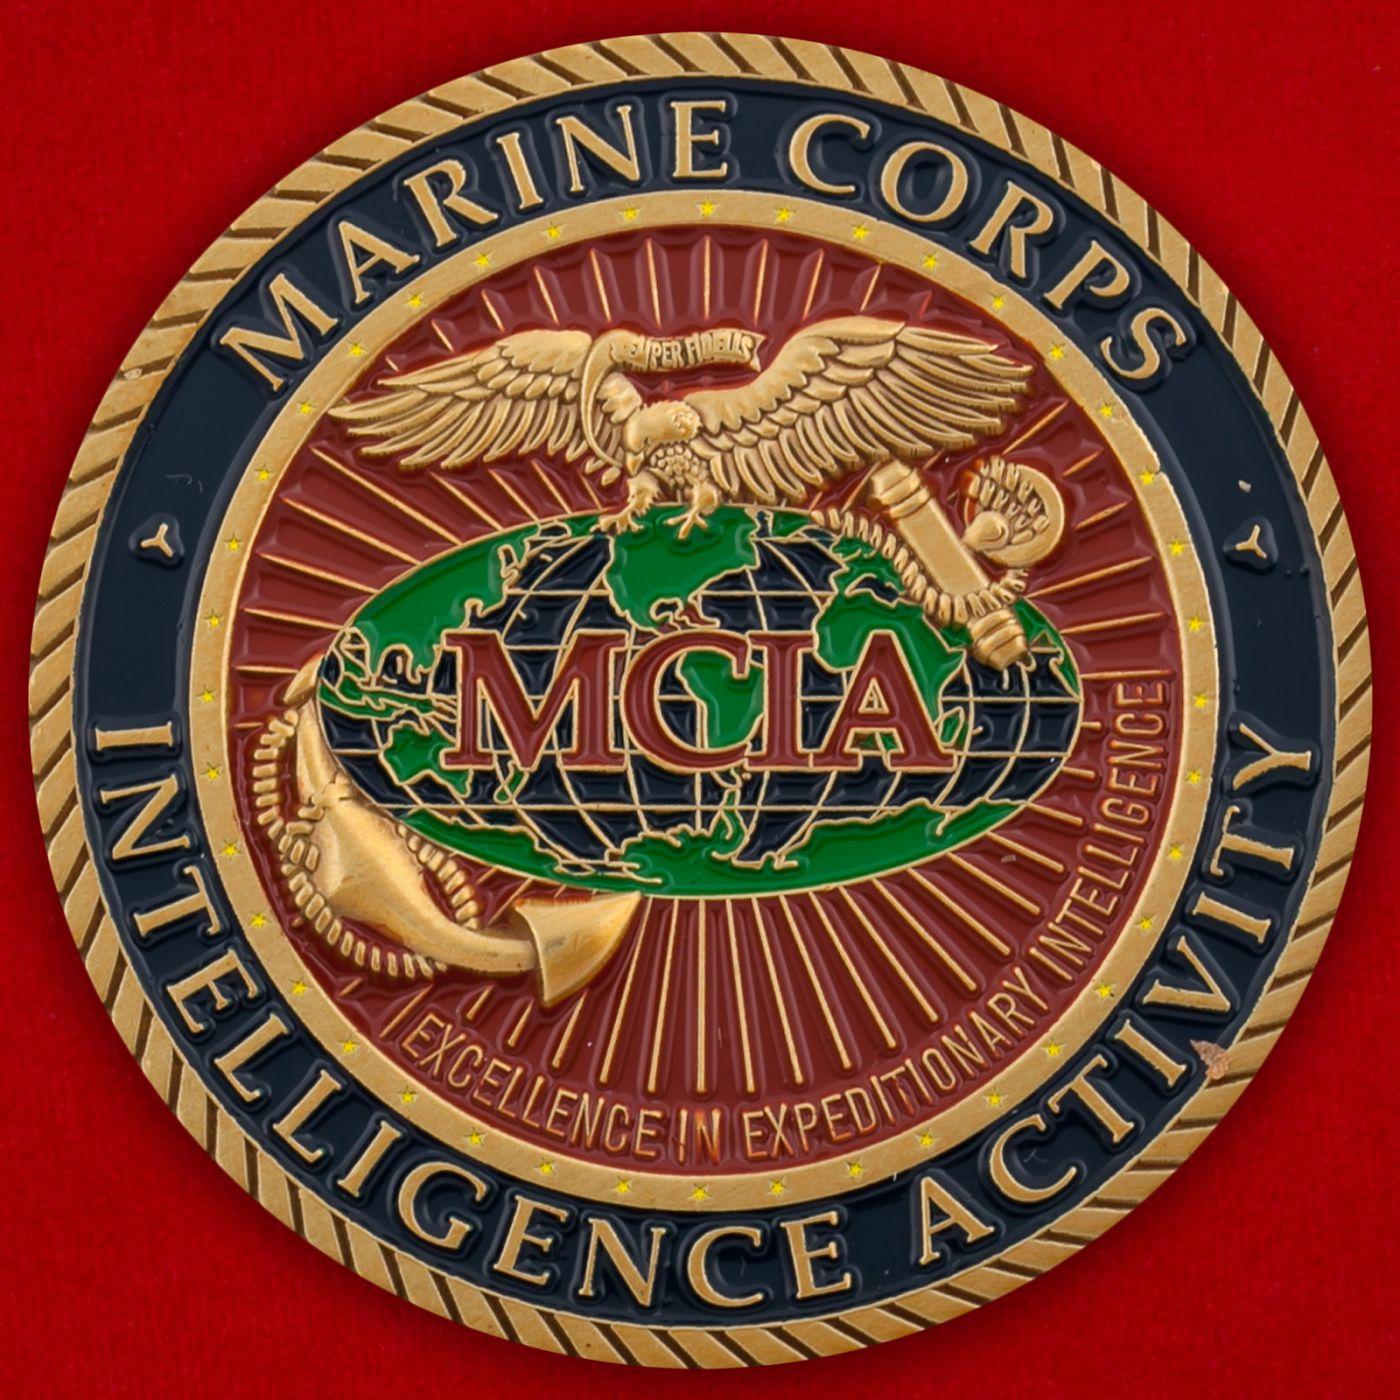 Челлендж коин разведки Корпуса Морской пехоты США